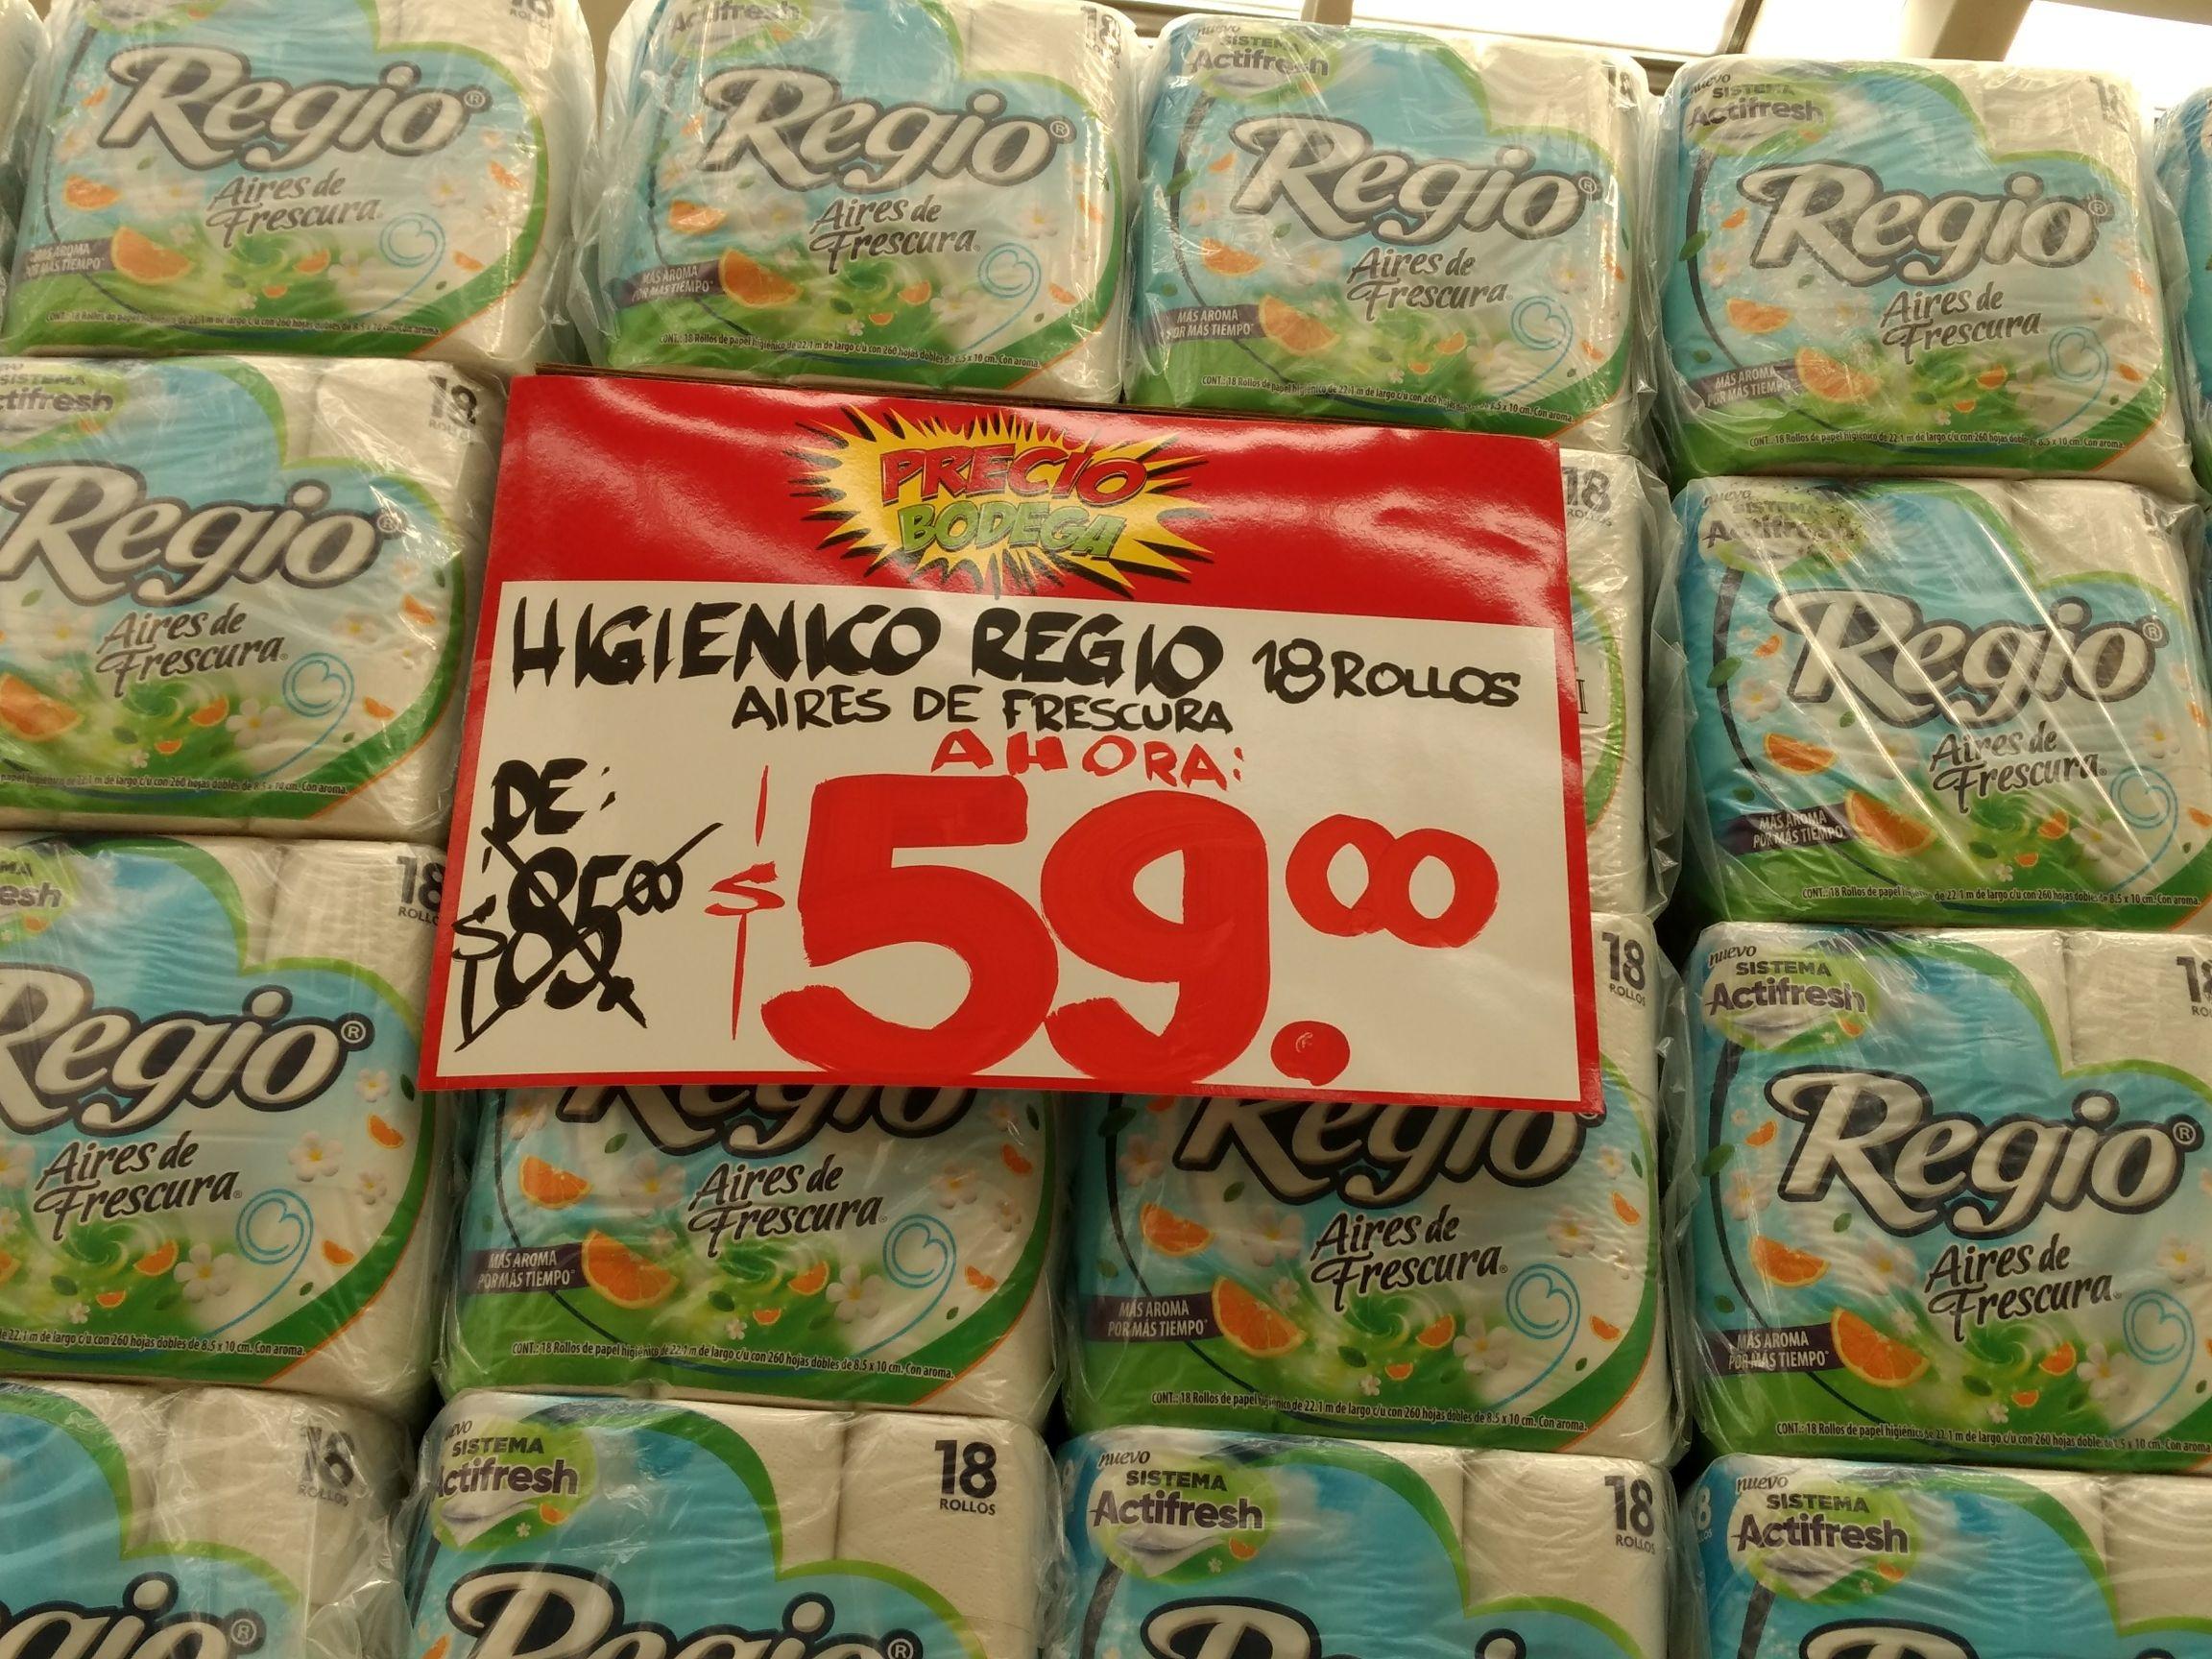 Bodega Aurrera: Papel higiénico aires de frescura